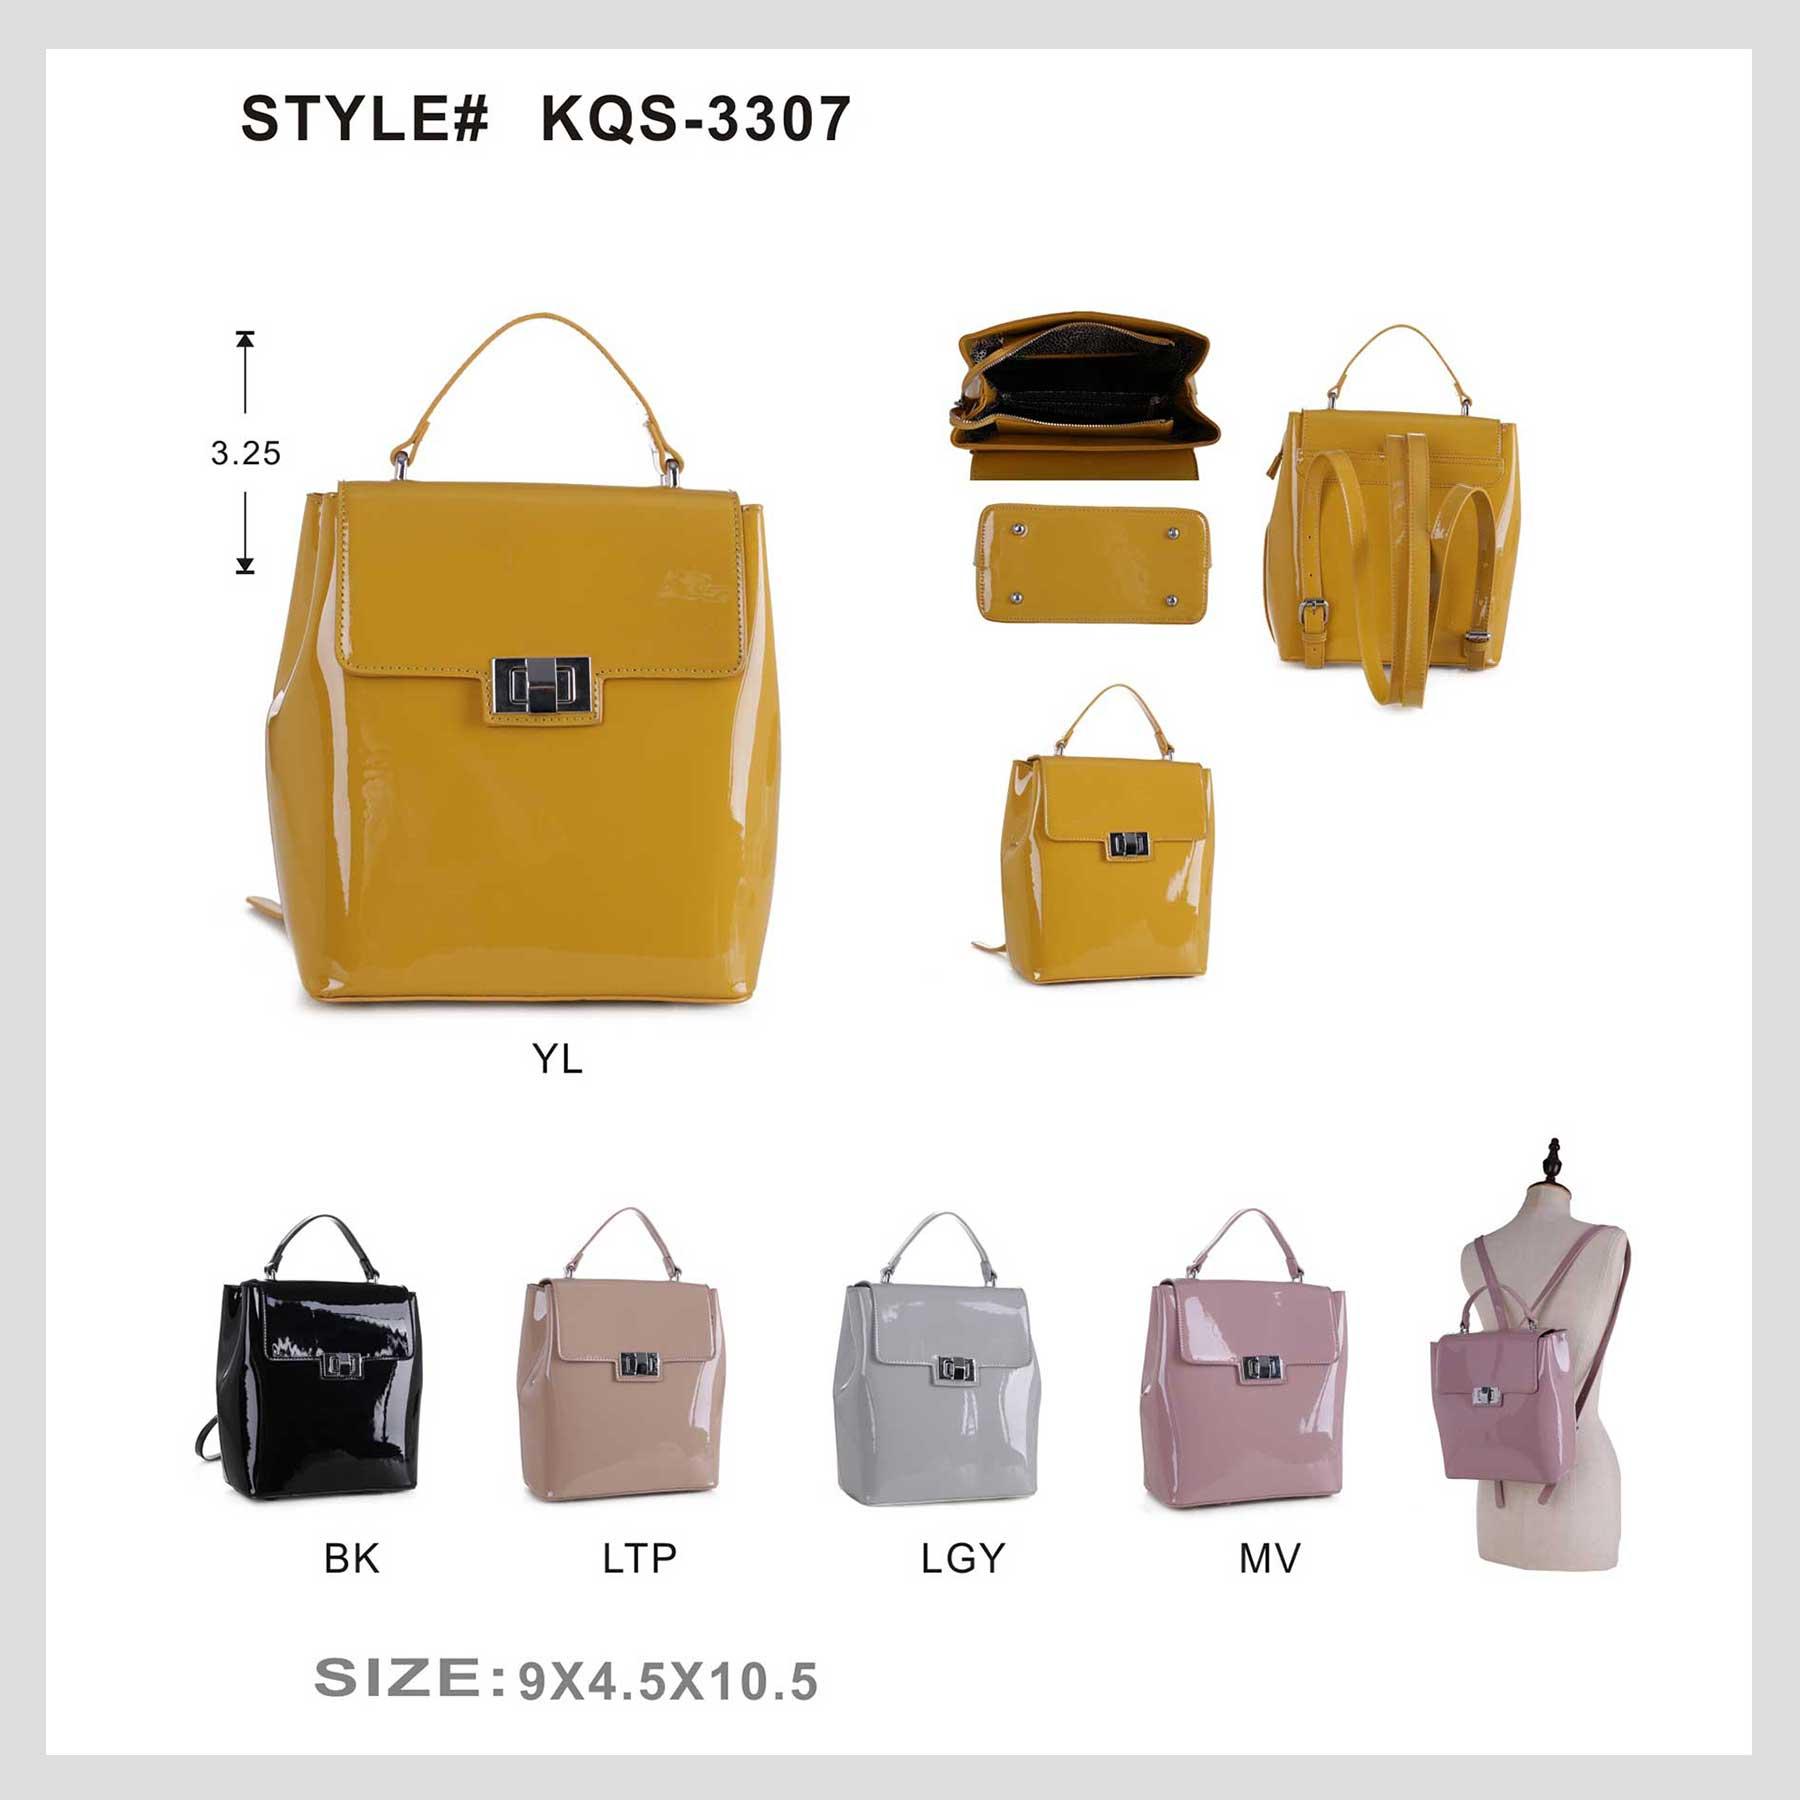 KQS-3307.jpg